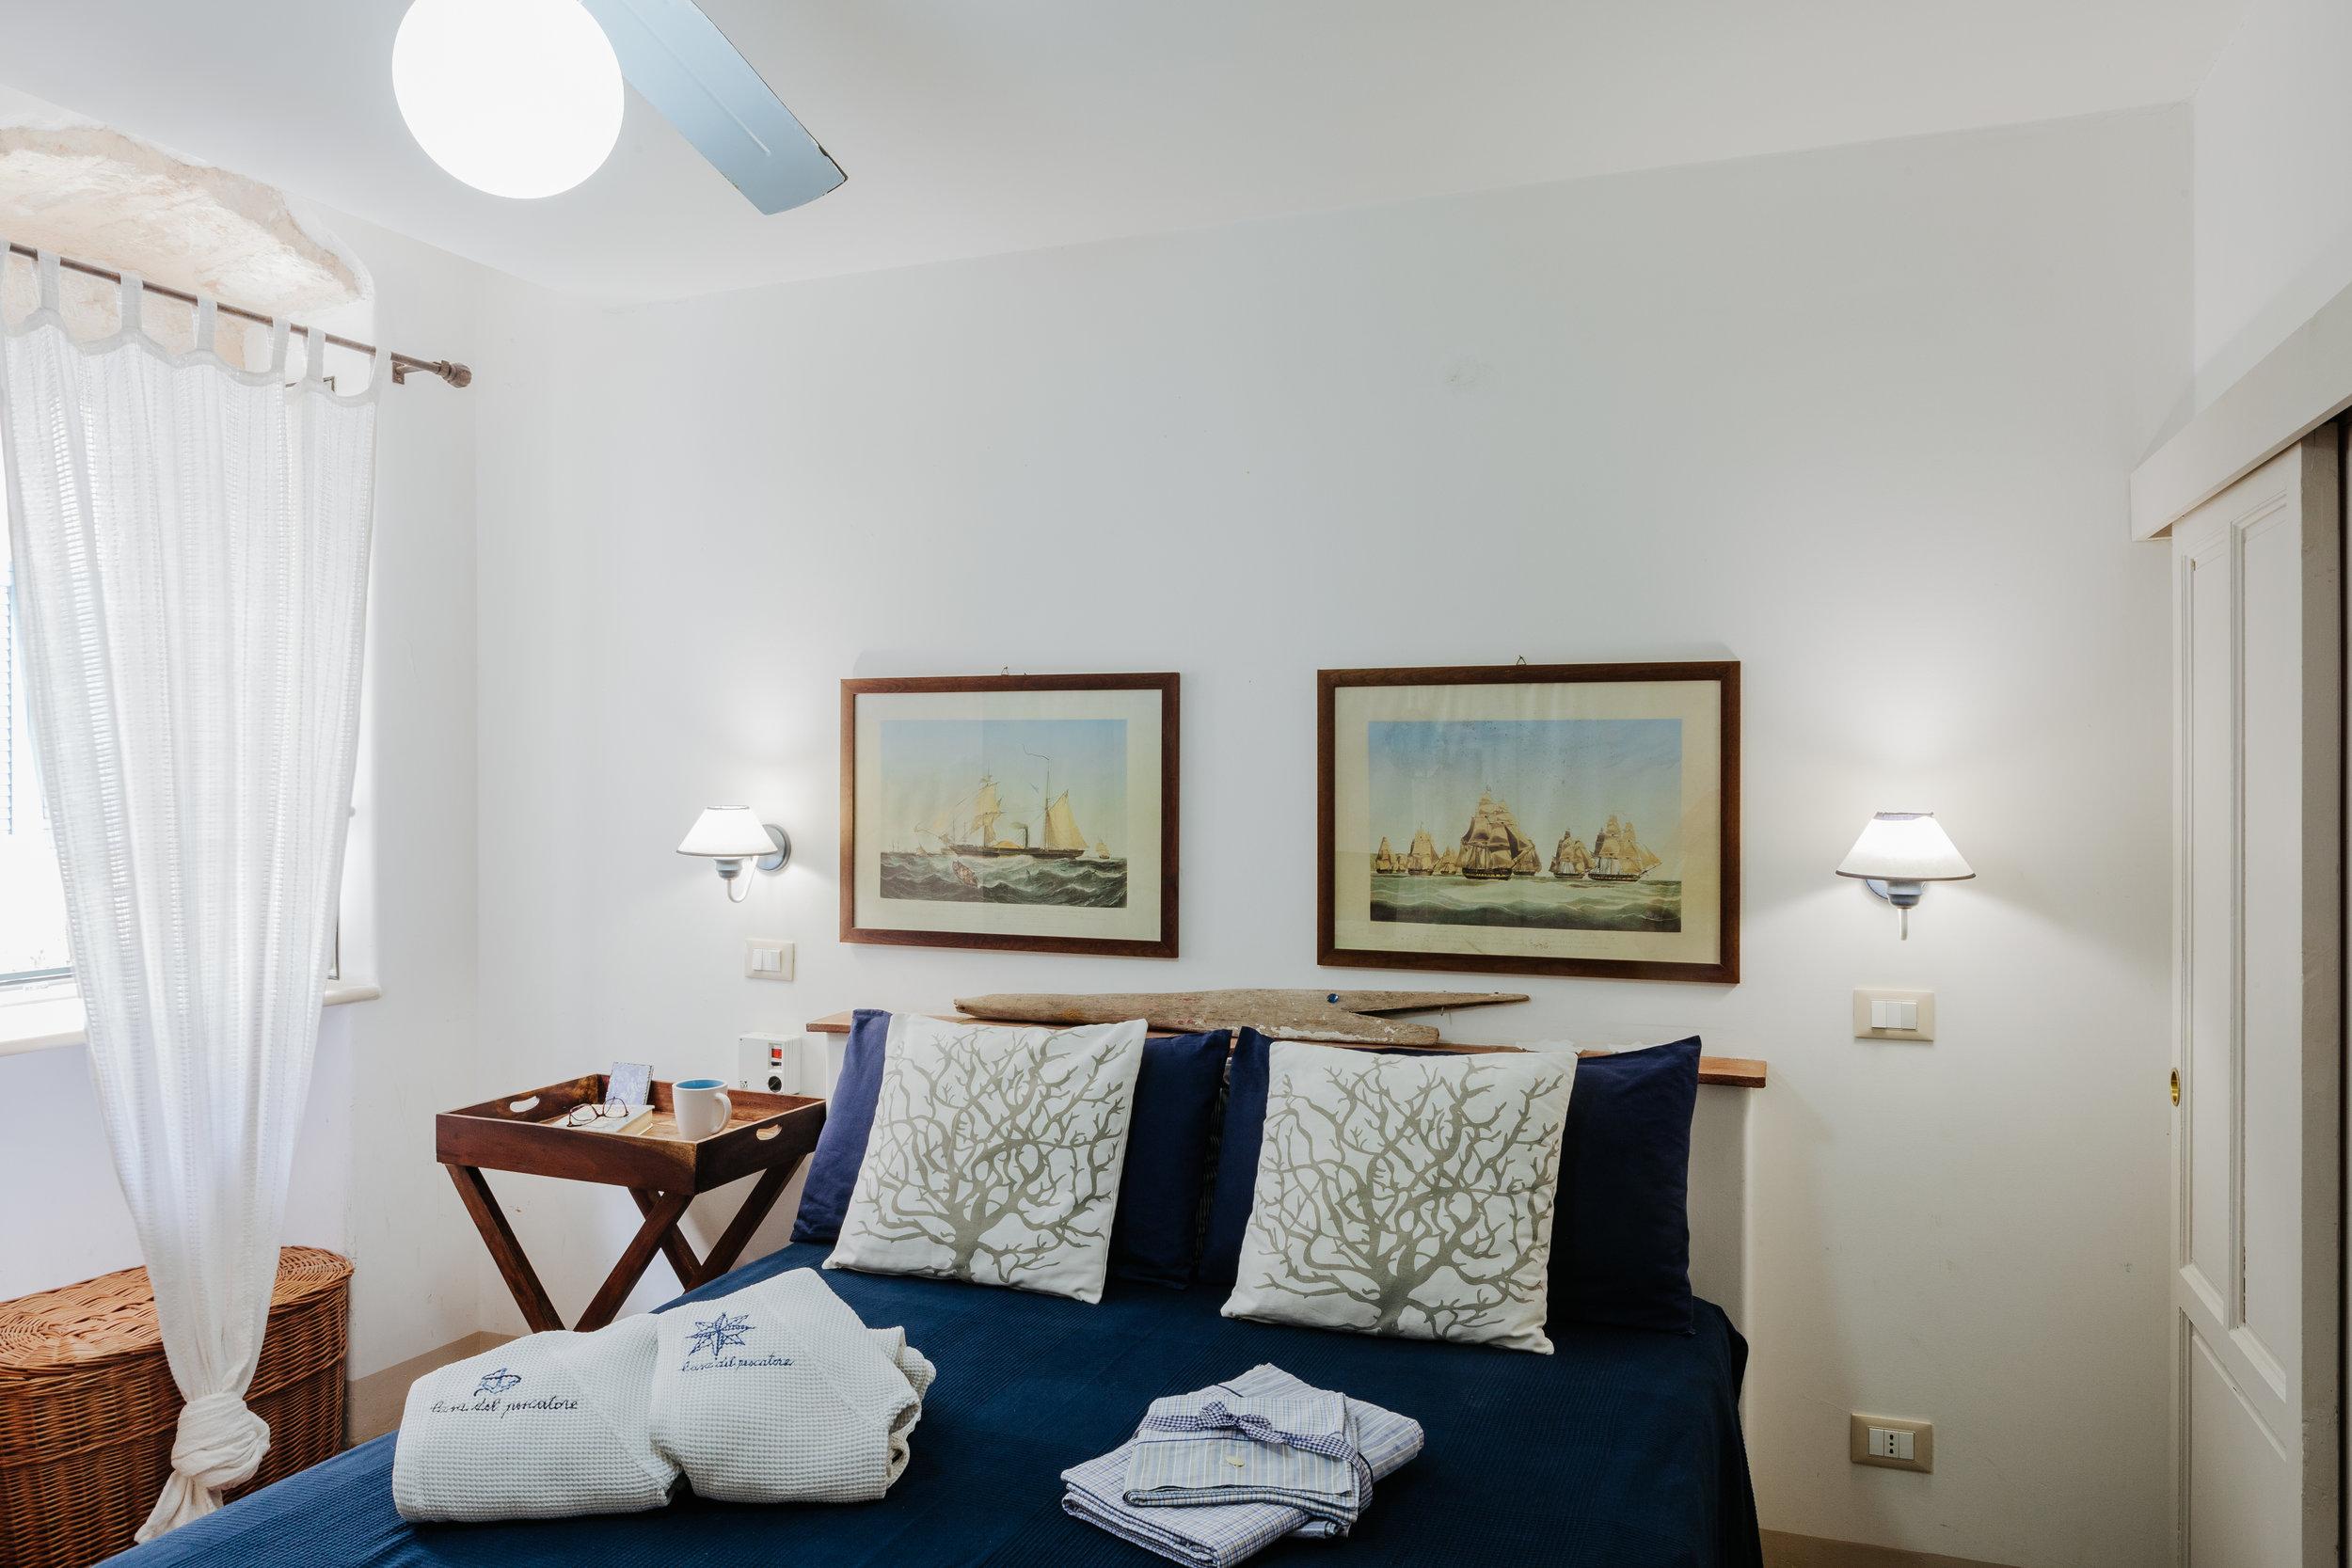 8sampieri-casa-vacanze-sicilia-appartamento-sicily-holiday-apartment-casa-del-pescatore-italia-italy.jpg